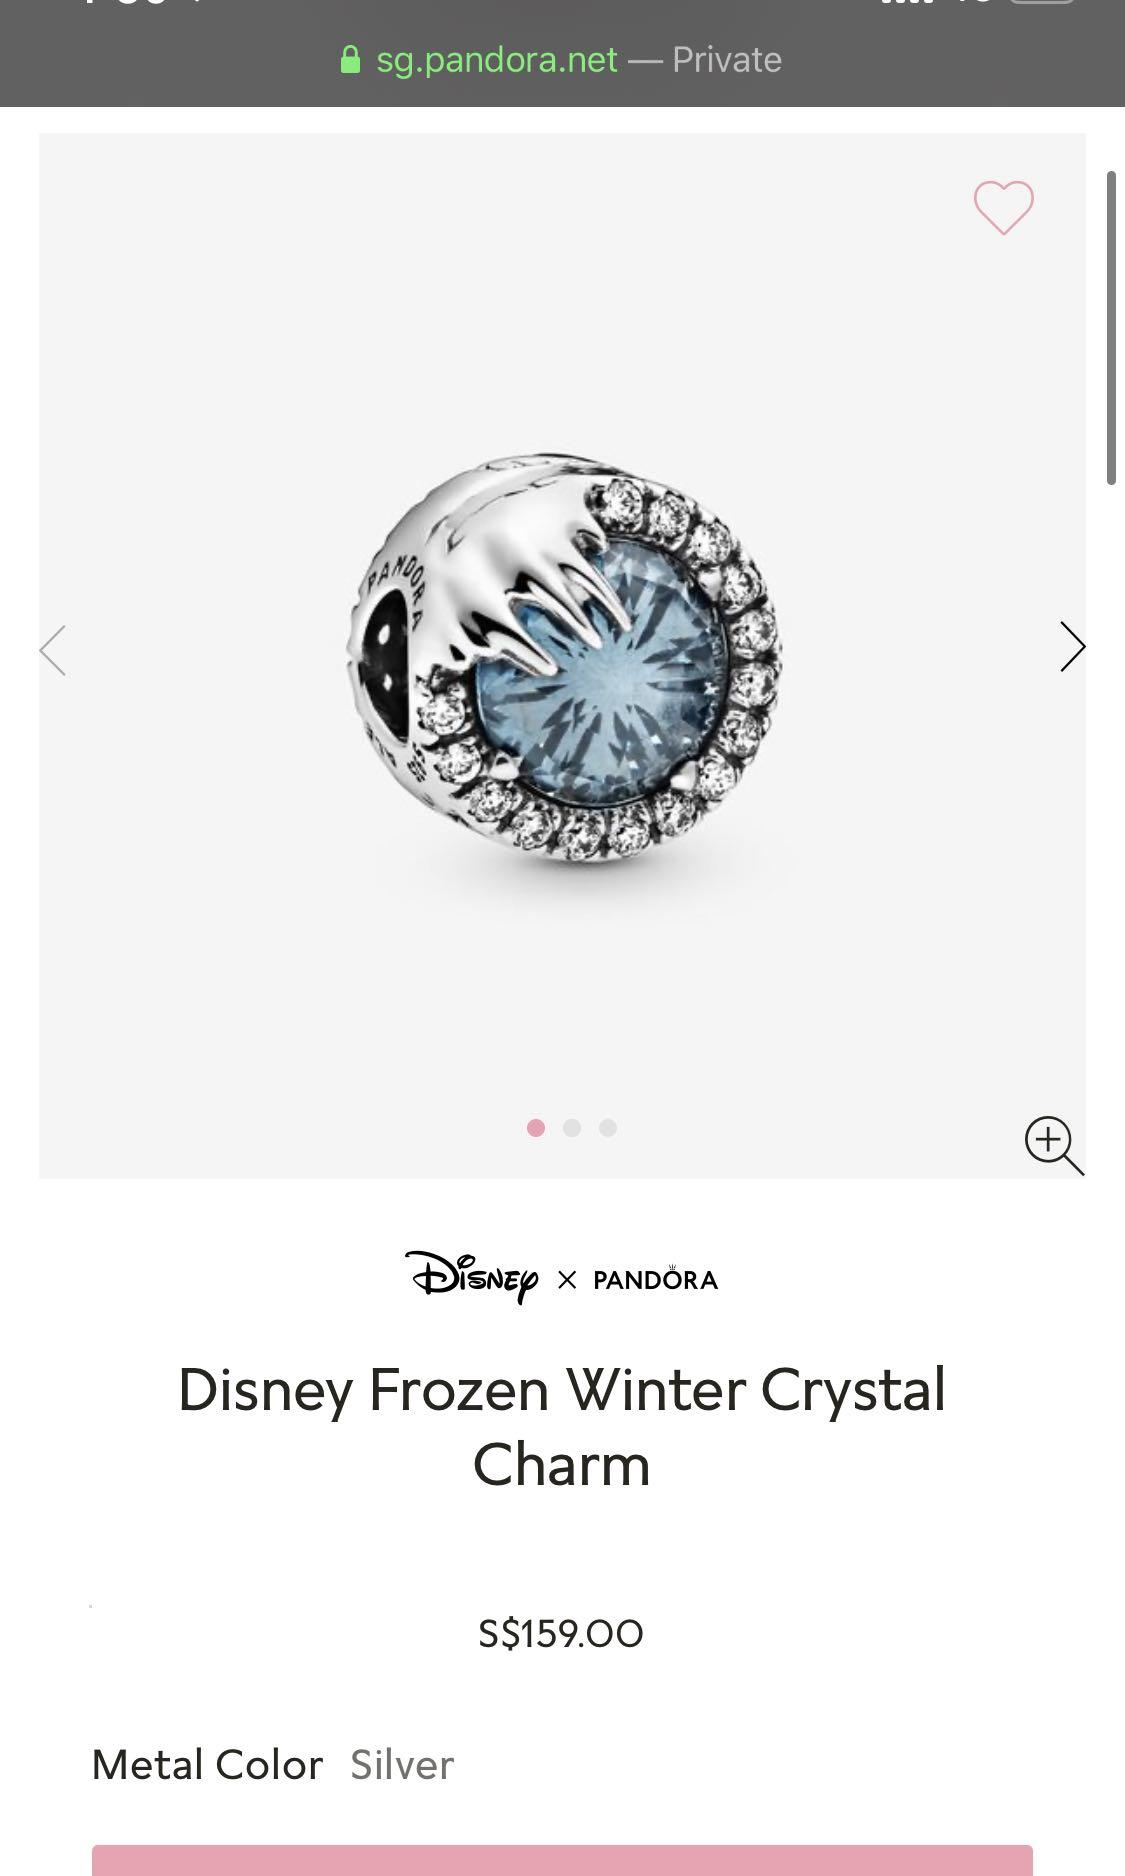 Pandora x Disney Frozen series charm